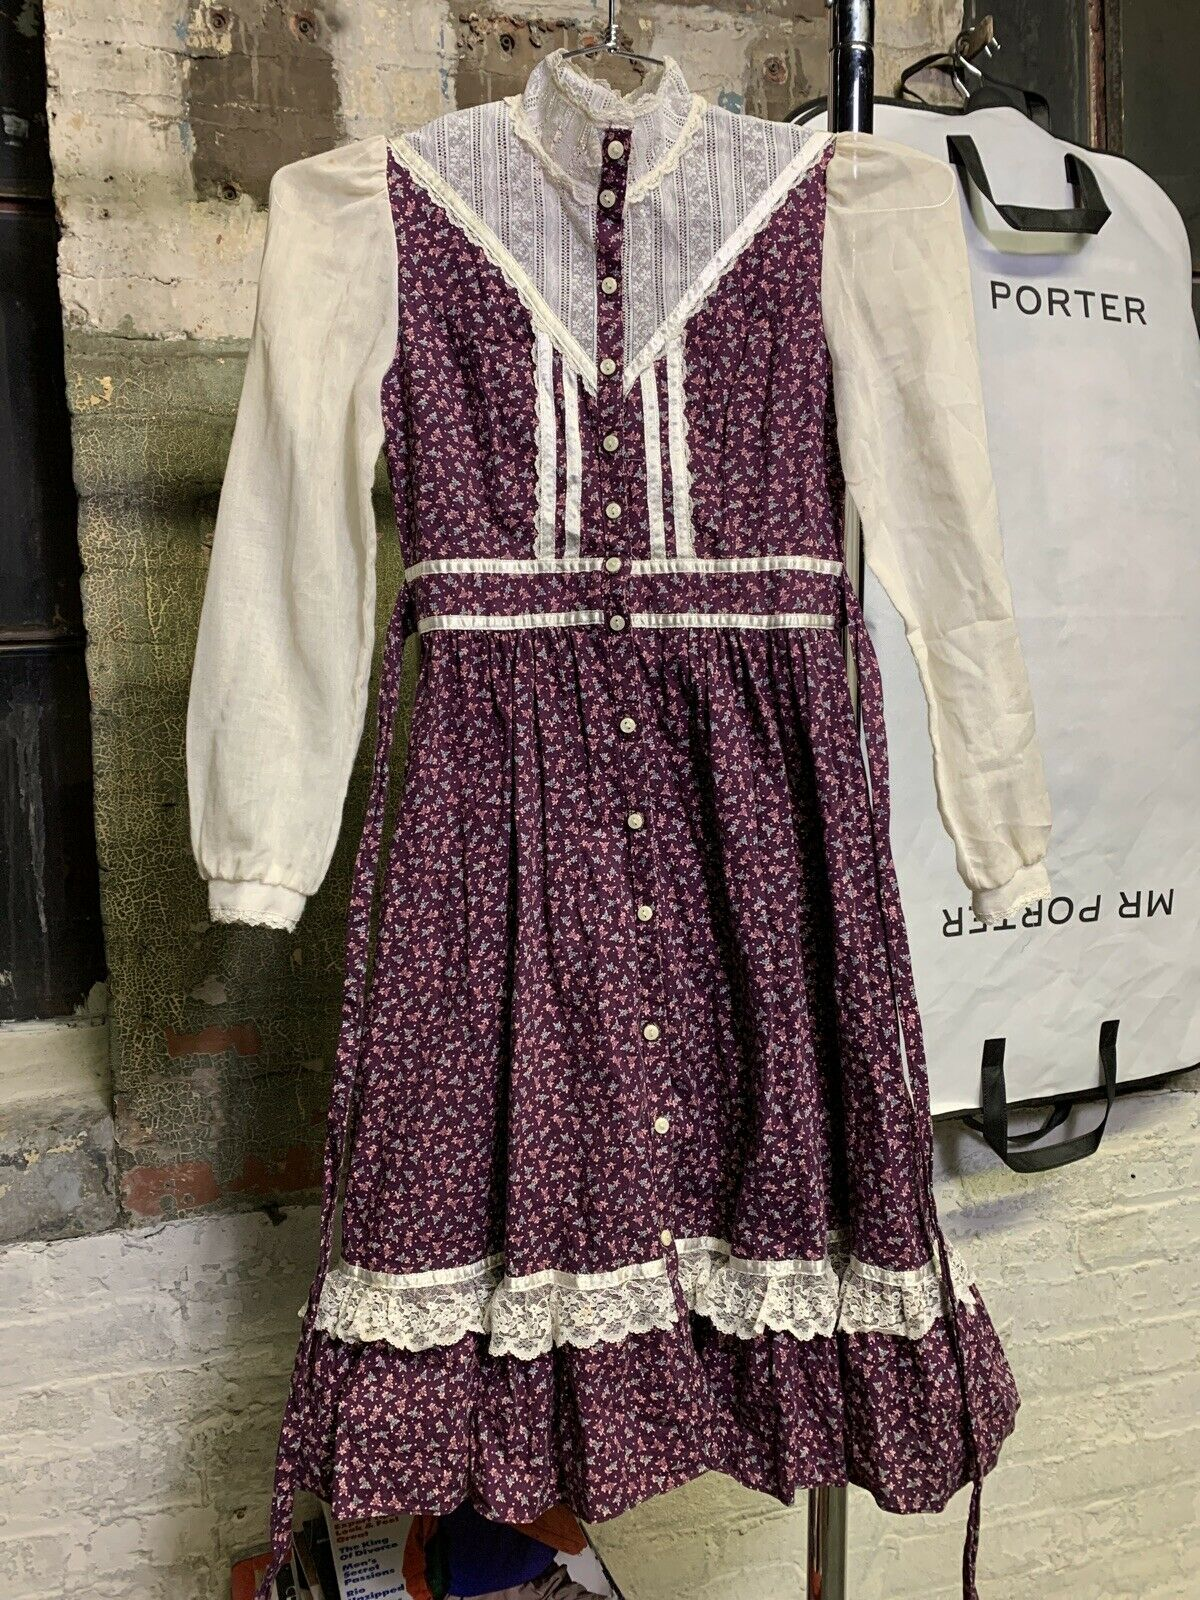 gunne sax 1970s women's vintage dress - image 1